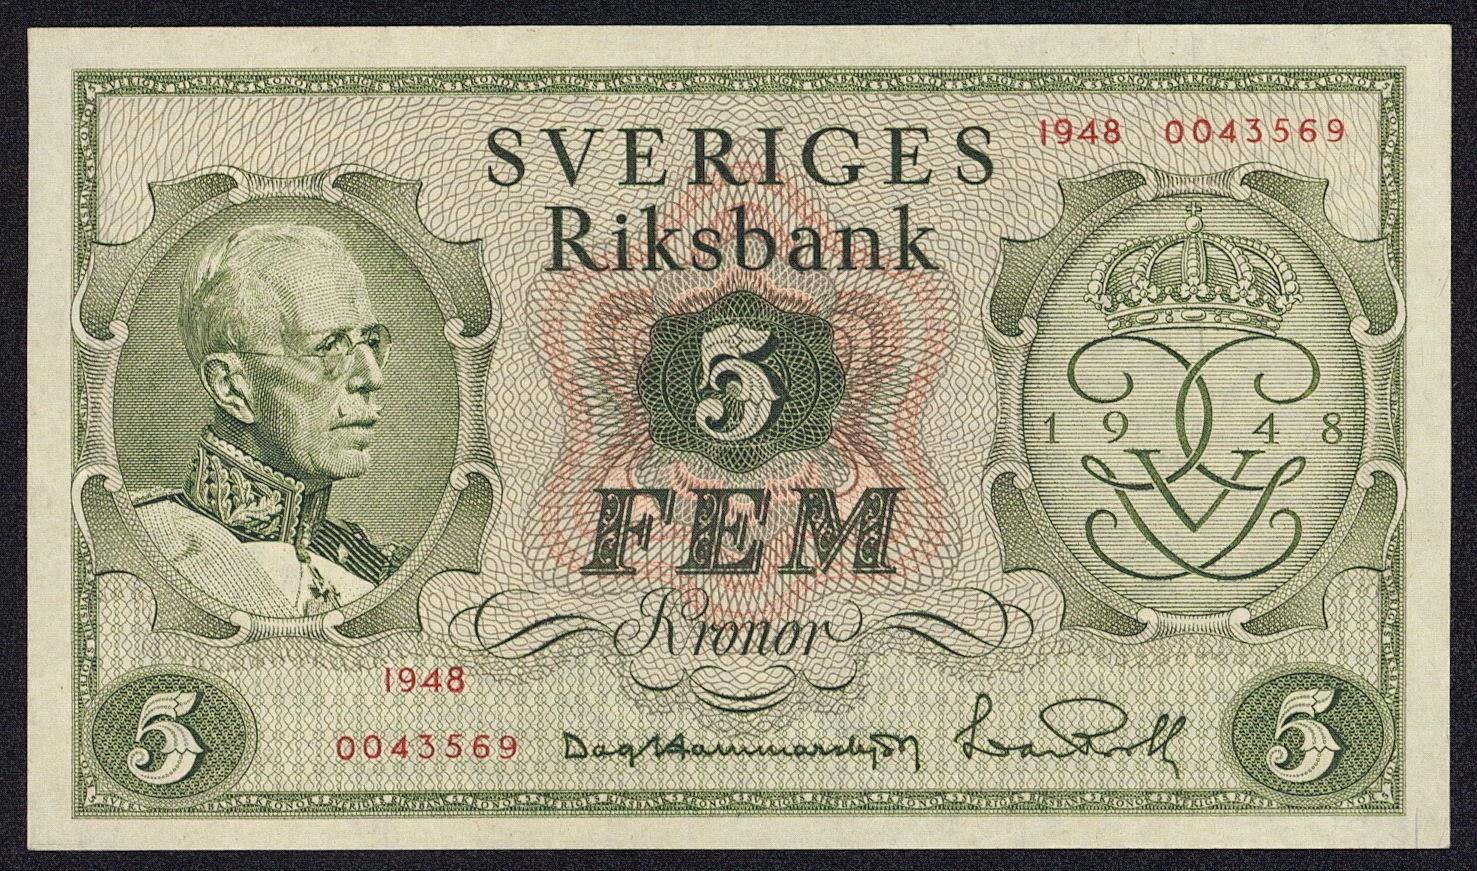 Sweden 5 Kronor jubilee banknote 1948 King Gustav V 90th birthday